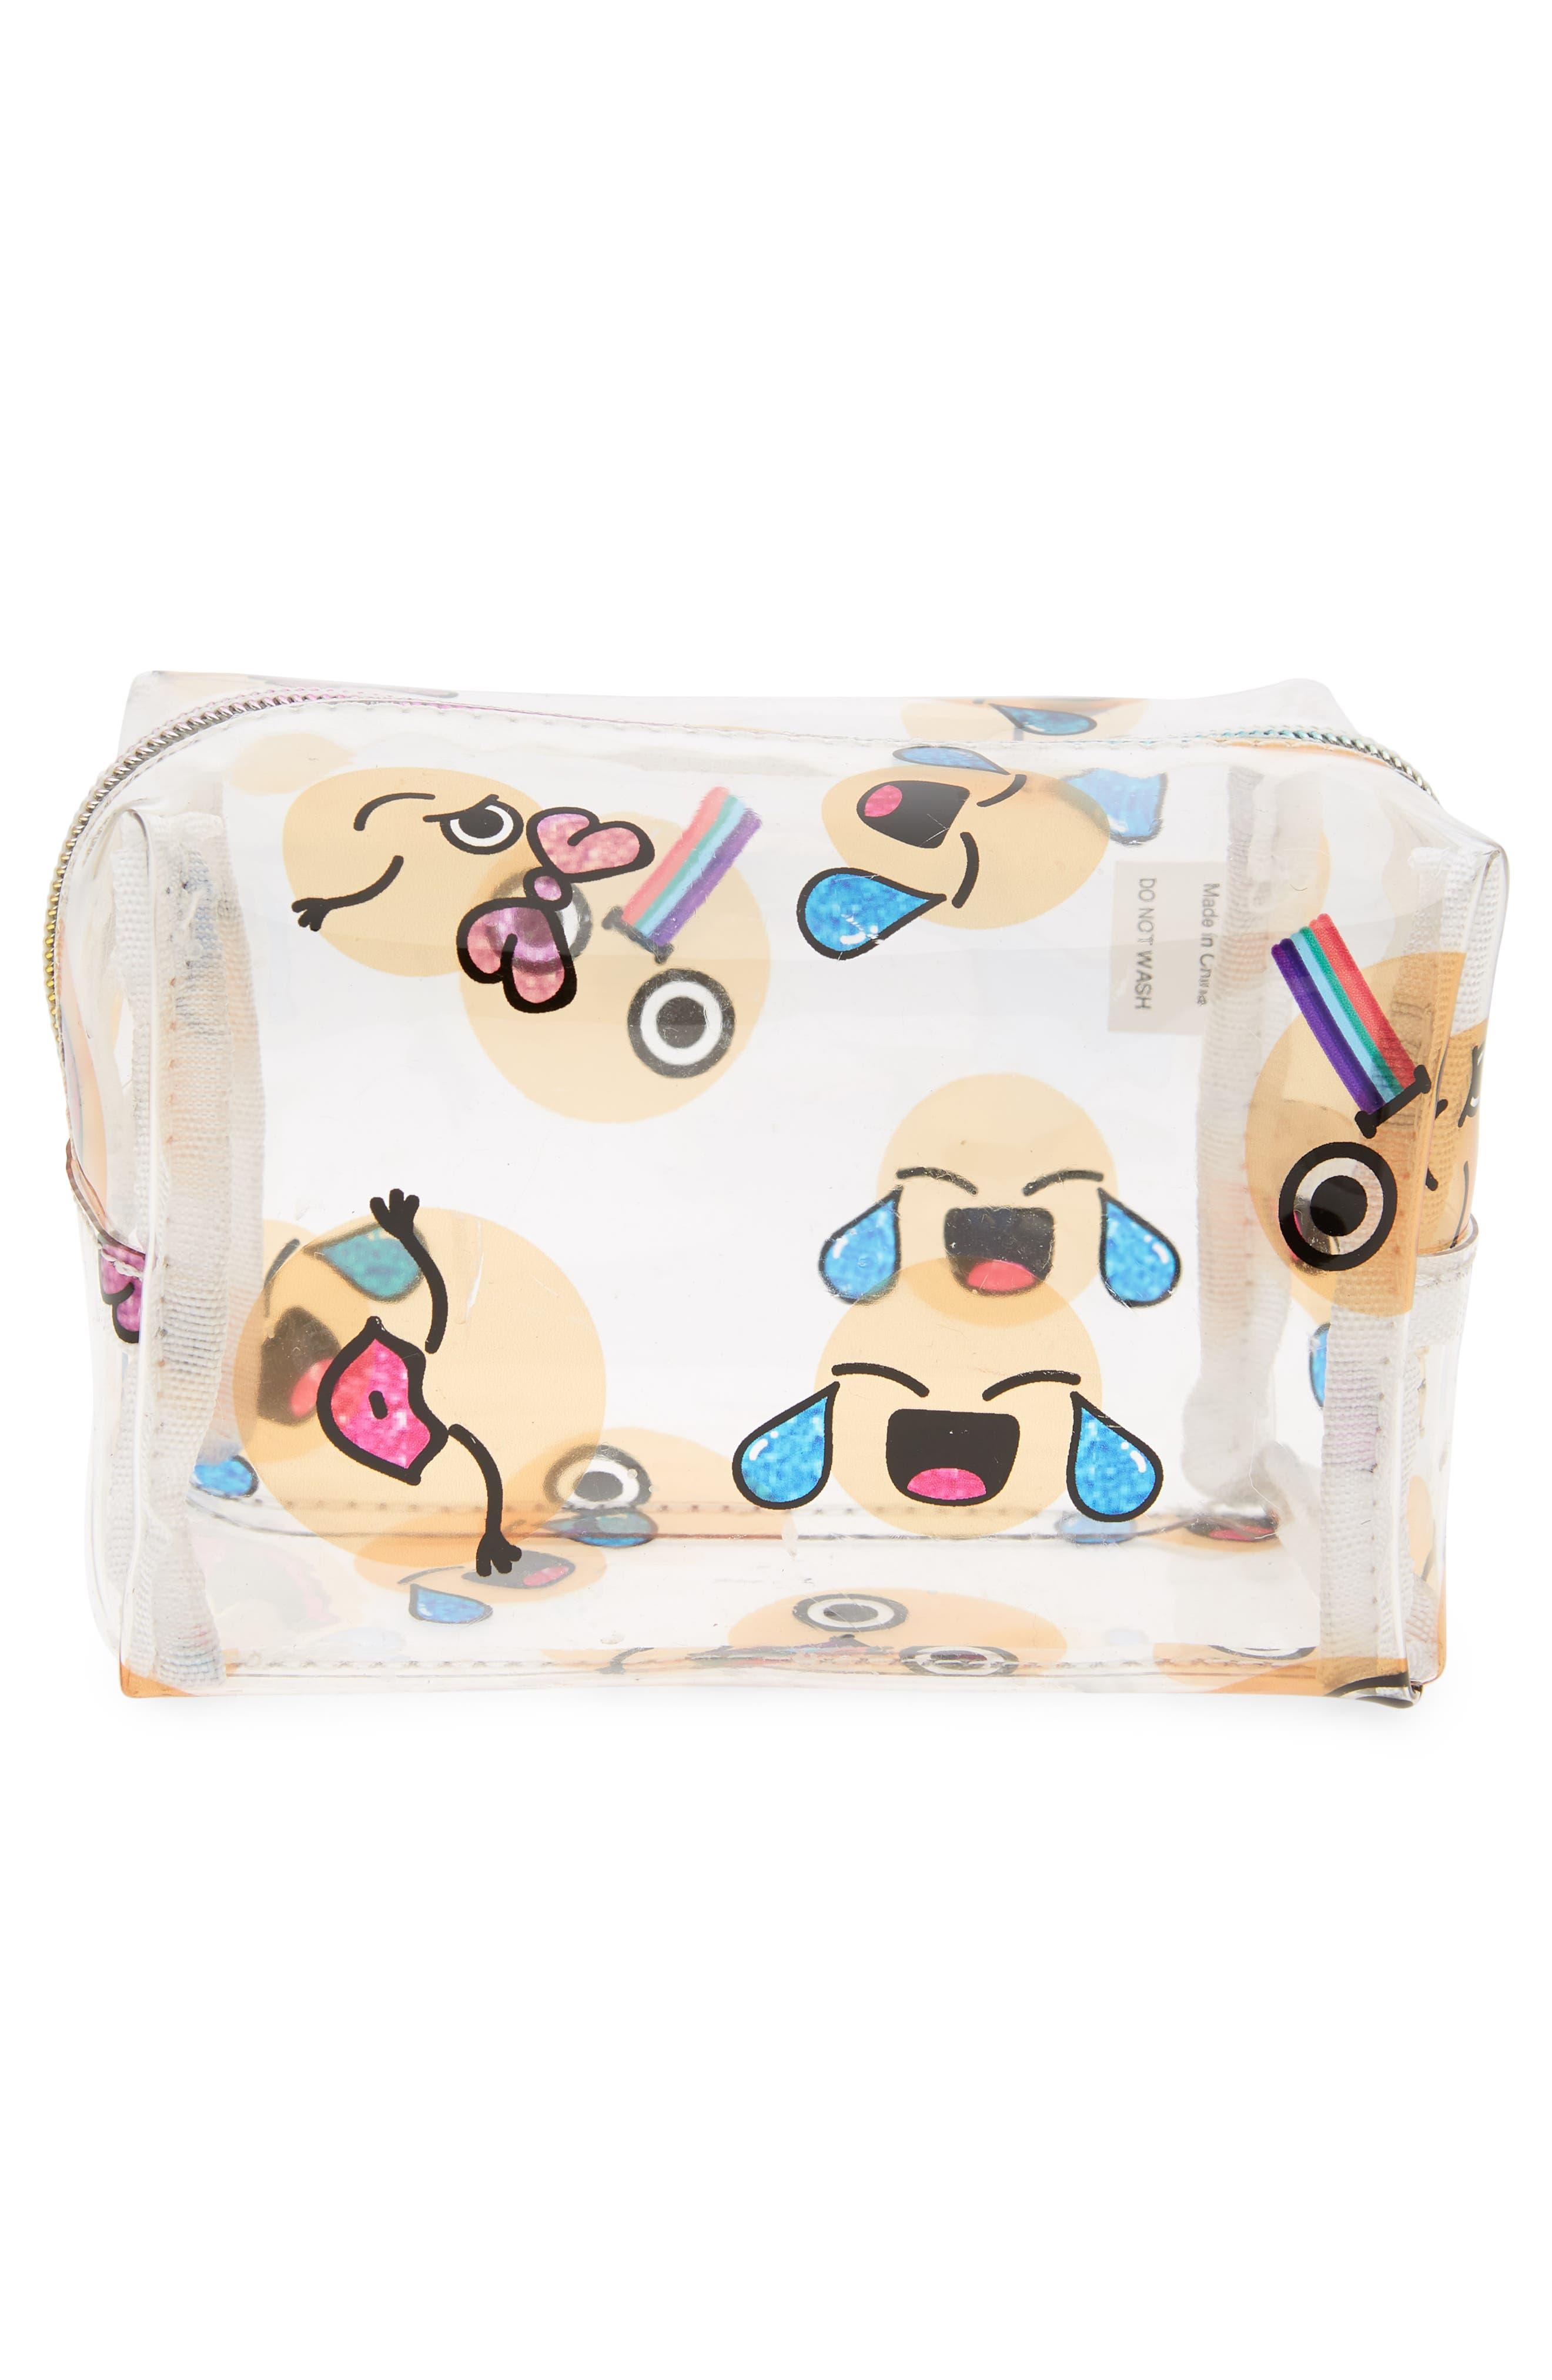 Emoji Cosmetics Case,                             Alternate thumbnail 2, color,                             Multi